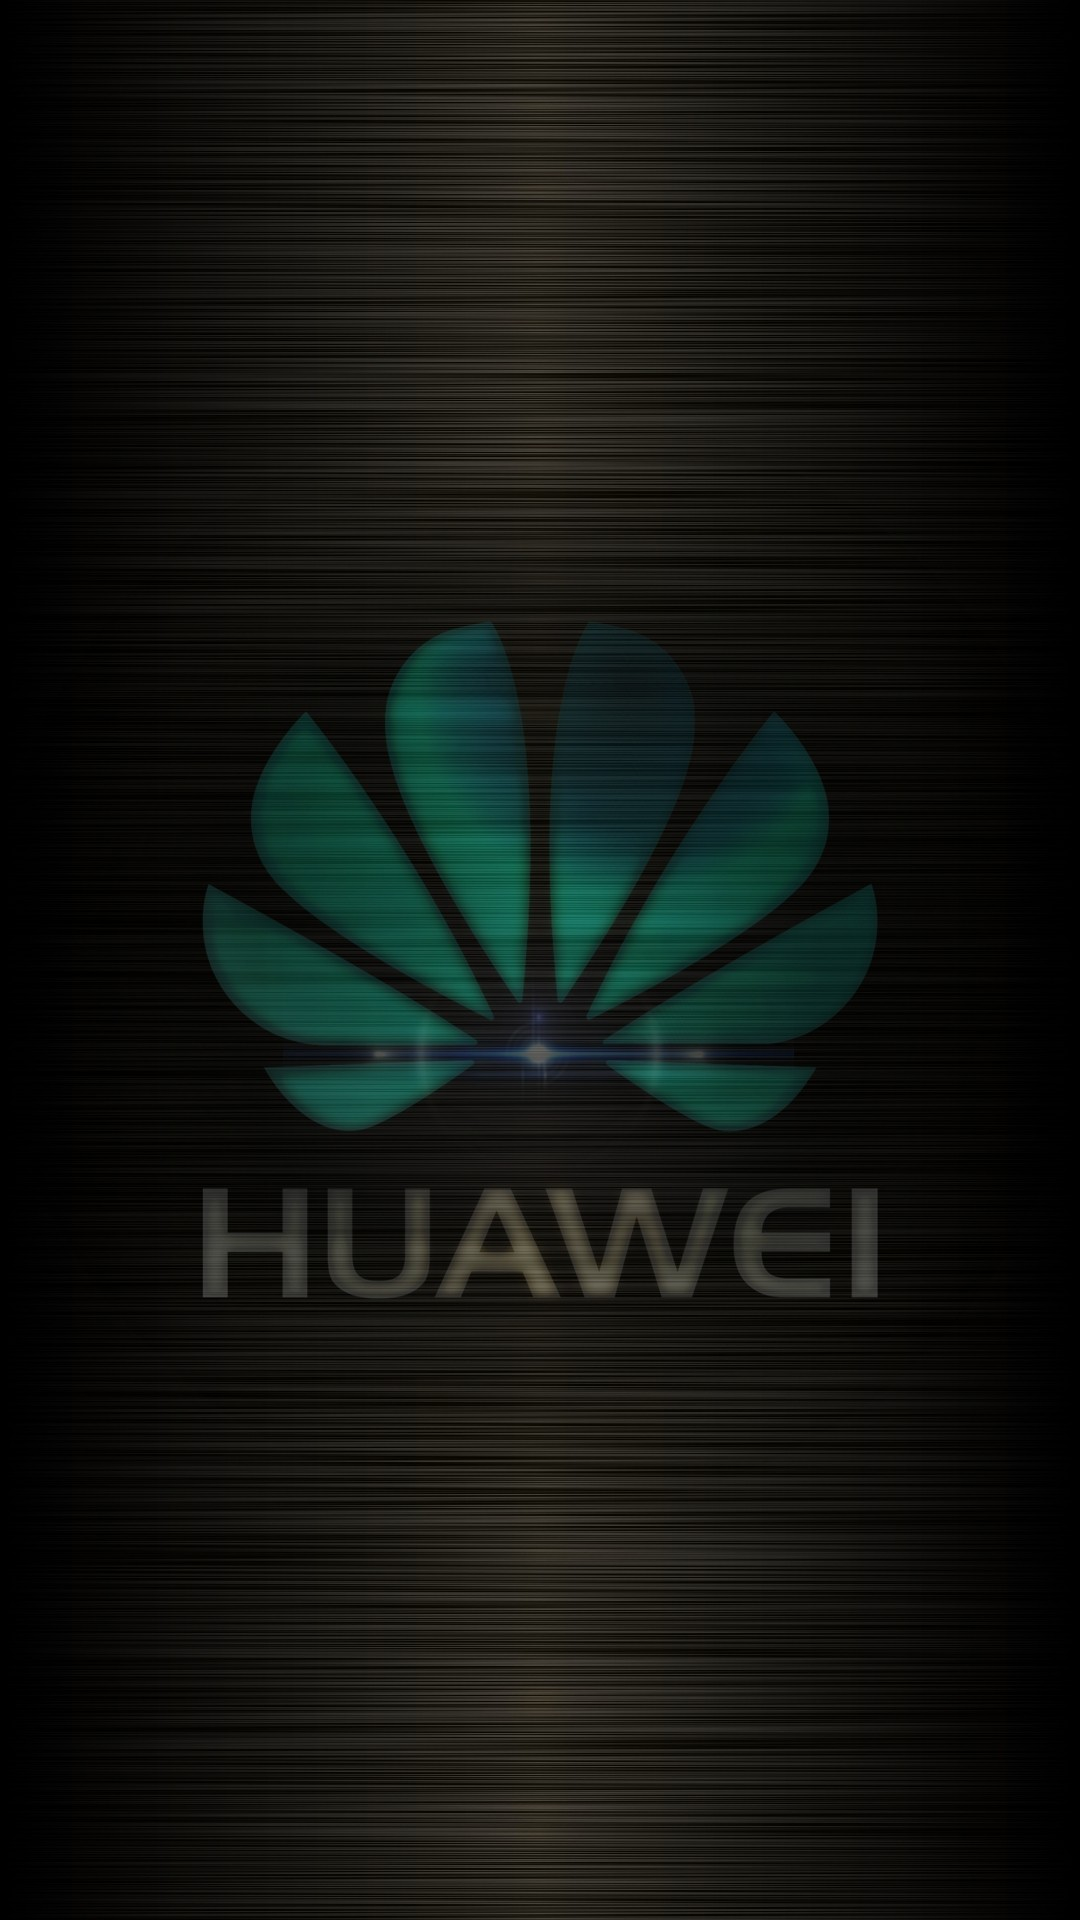 Motivational Hd Wallpapers 1080p Huawei Wallpaper 1080x1920